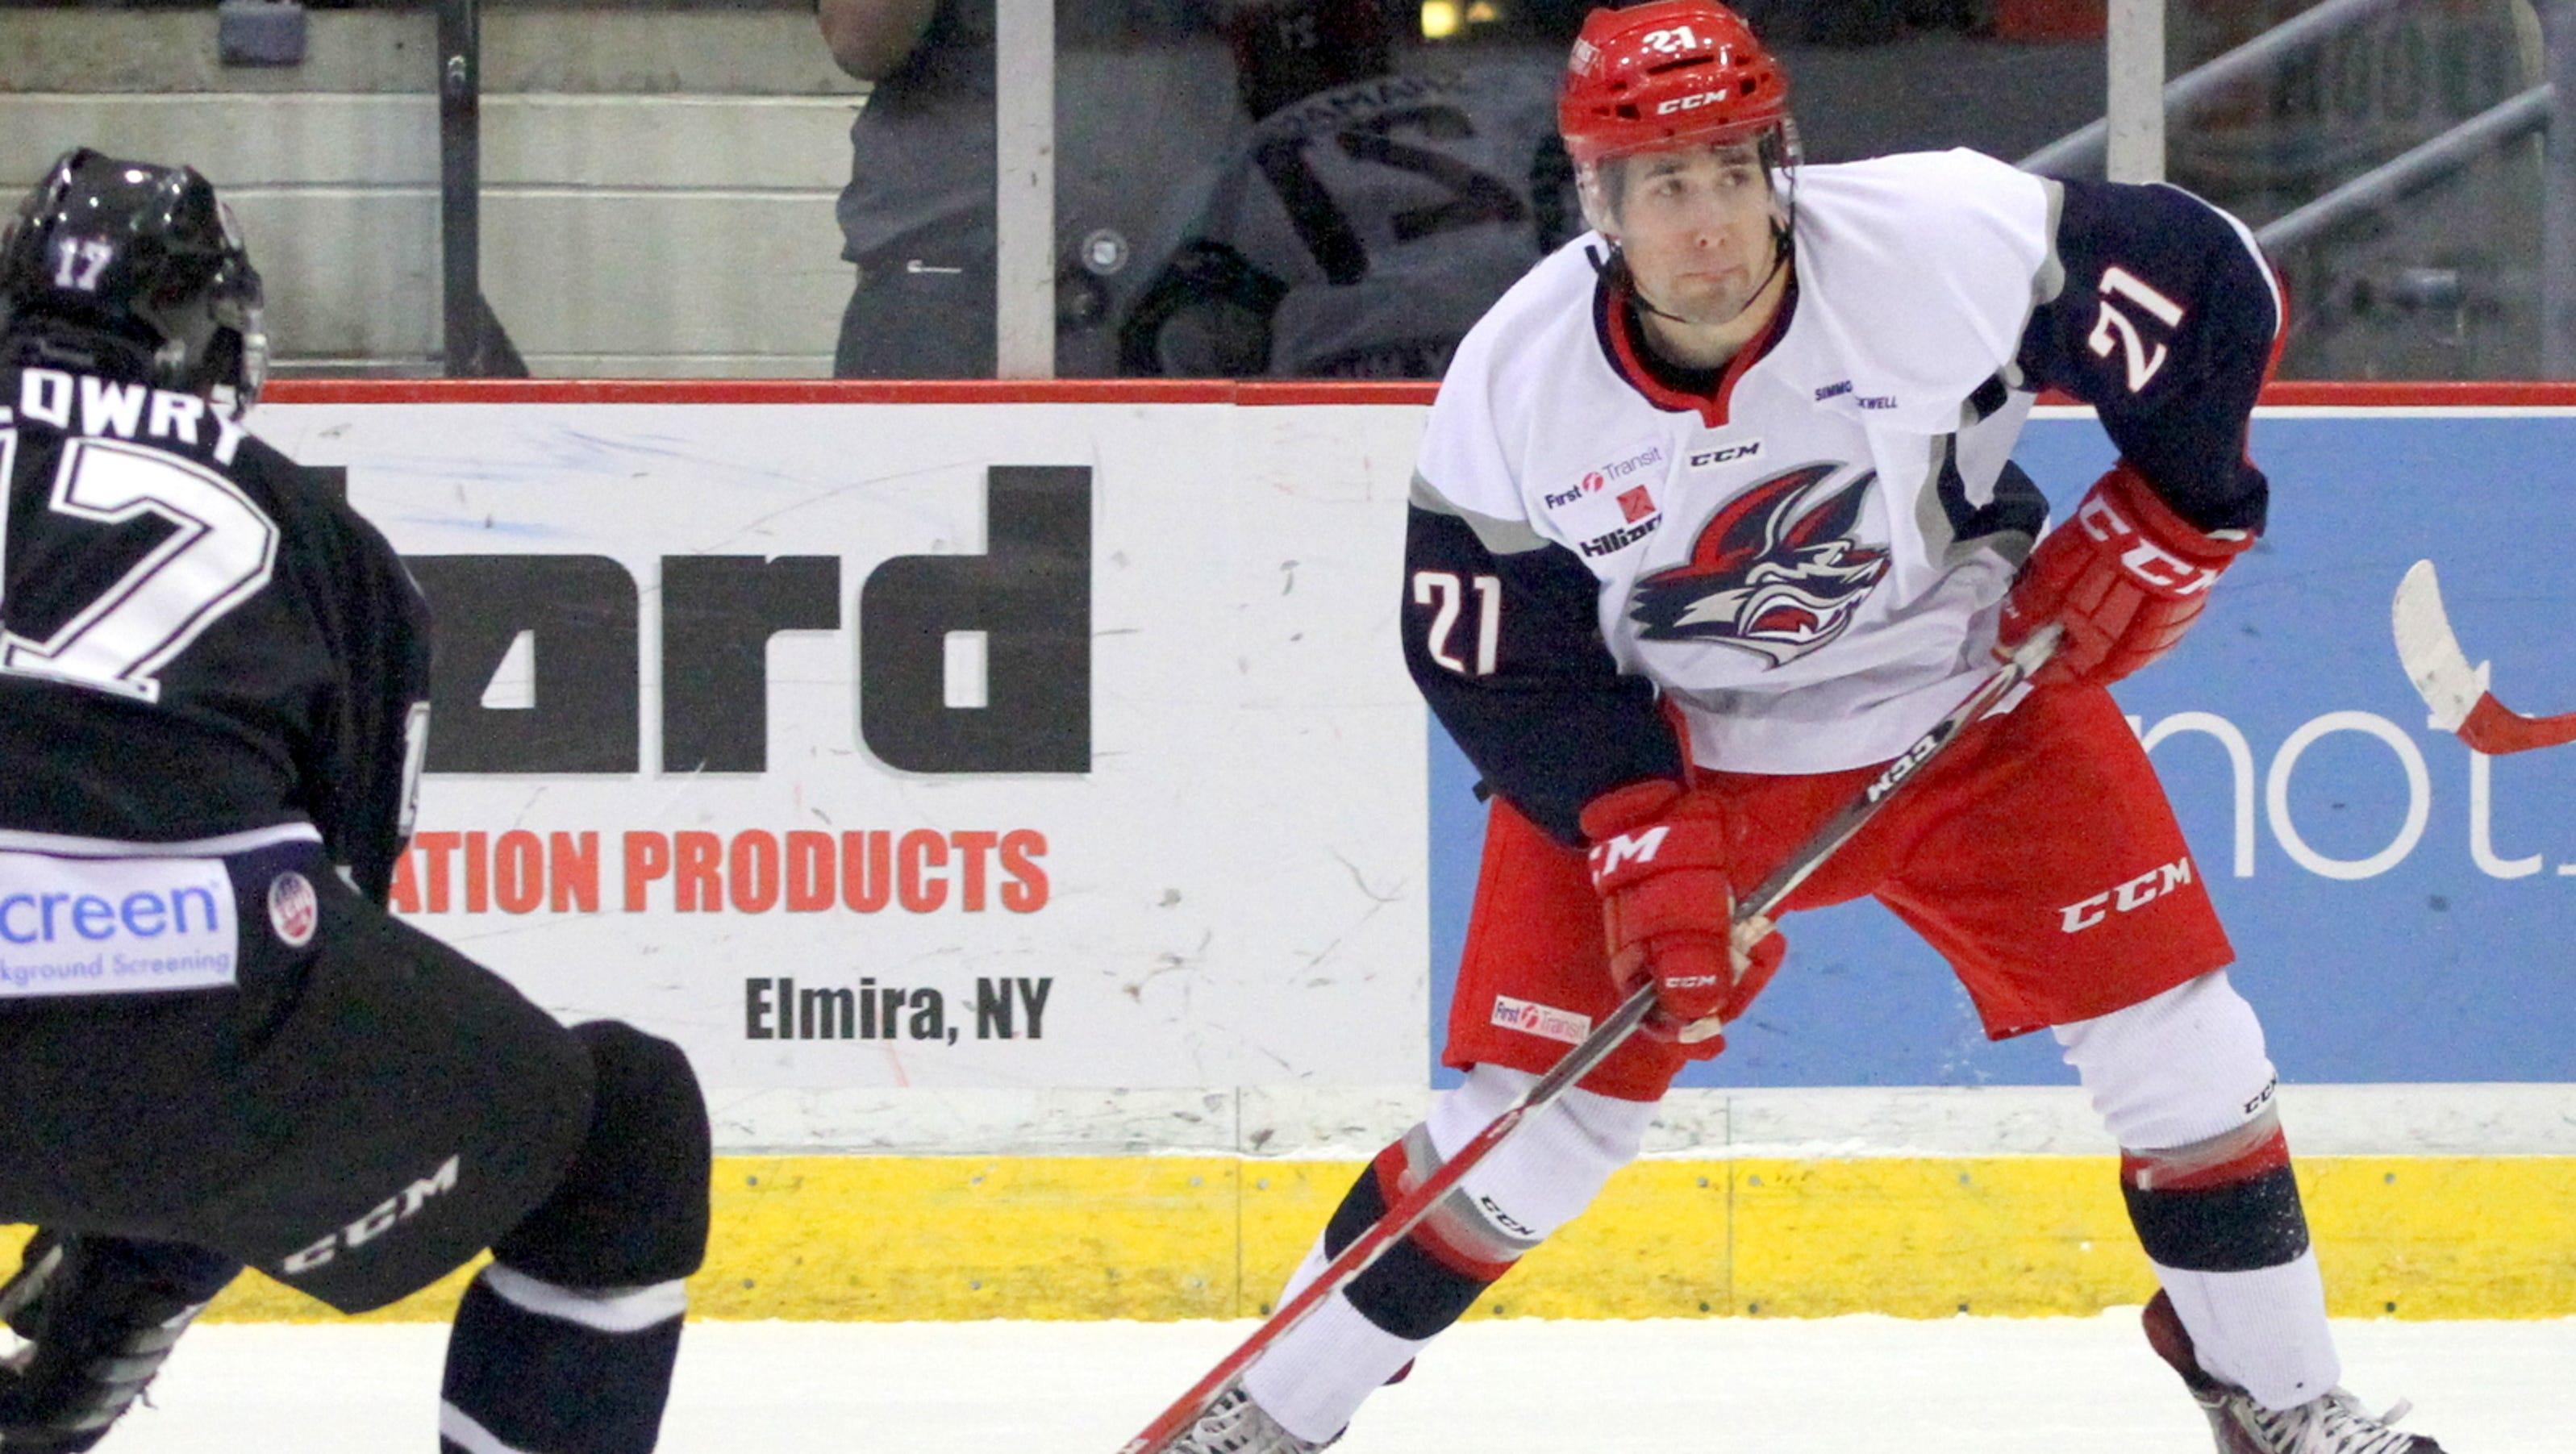 Jackals rookie Shamanski is playing at all-star level - Elmira Star-Gazette